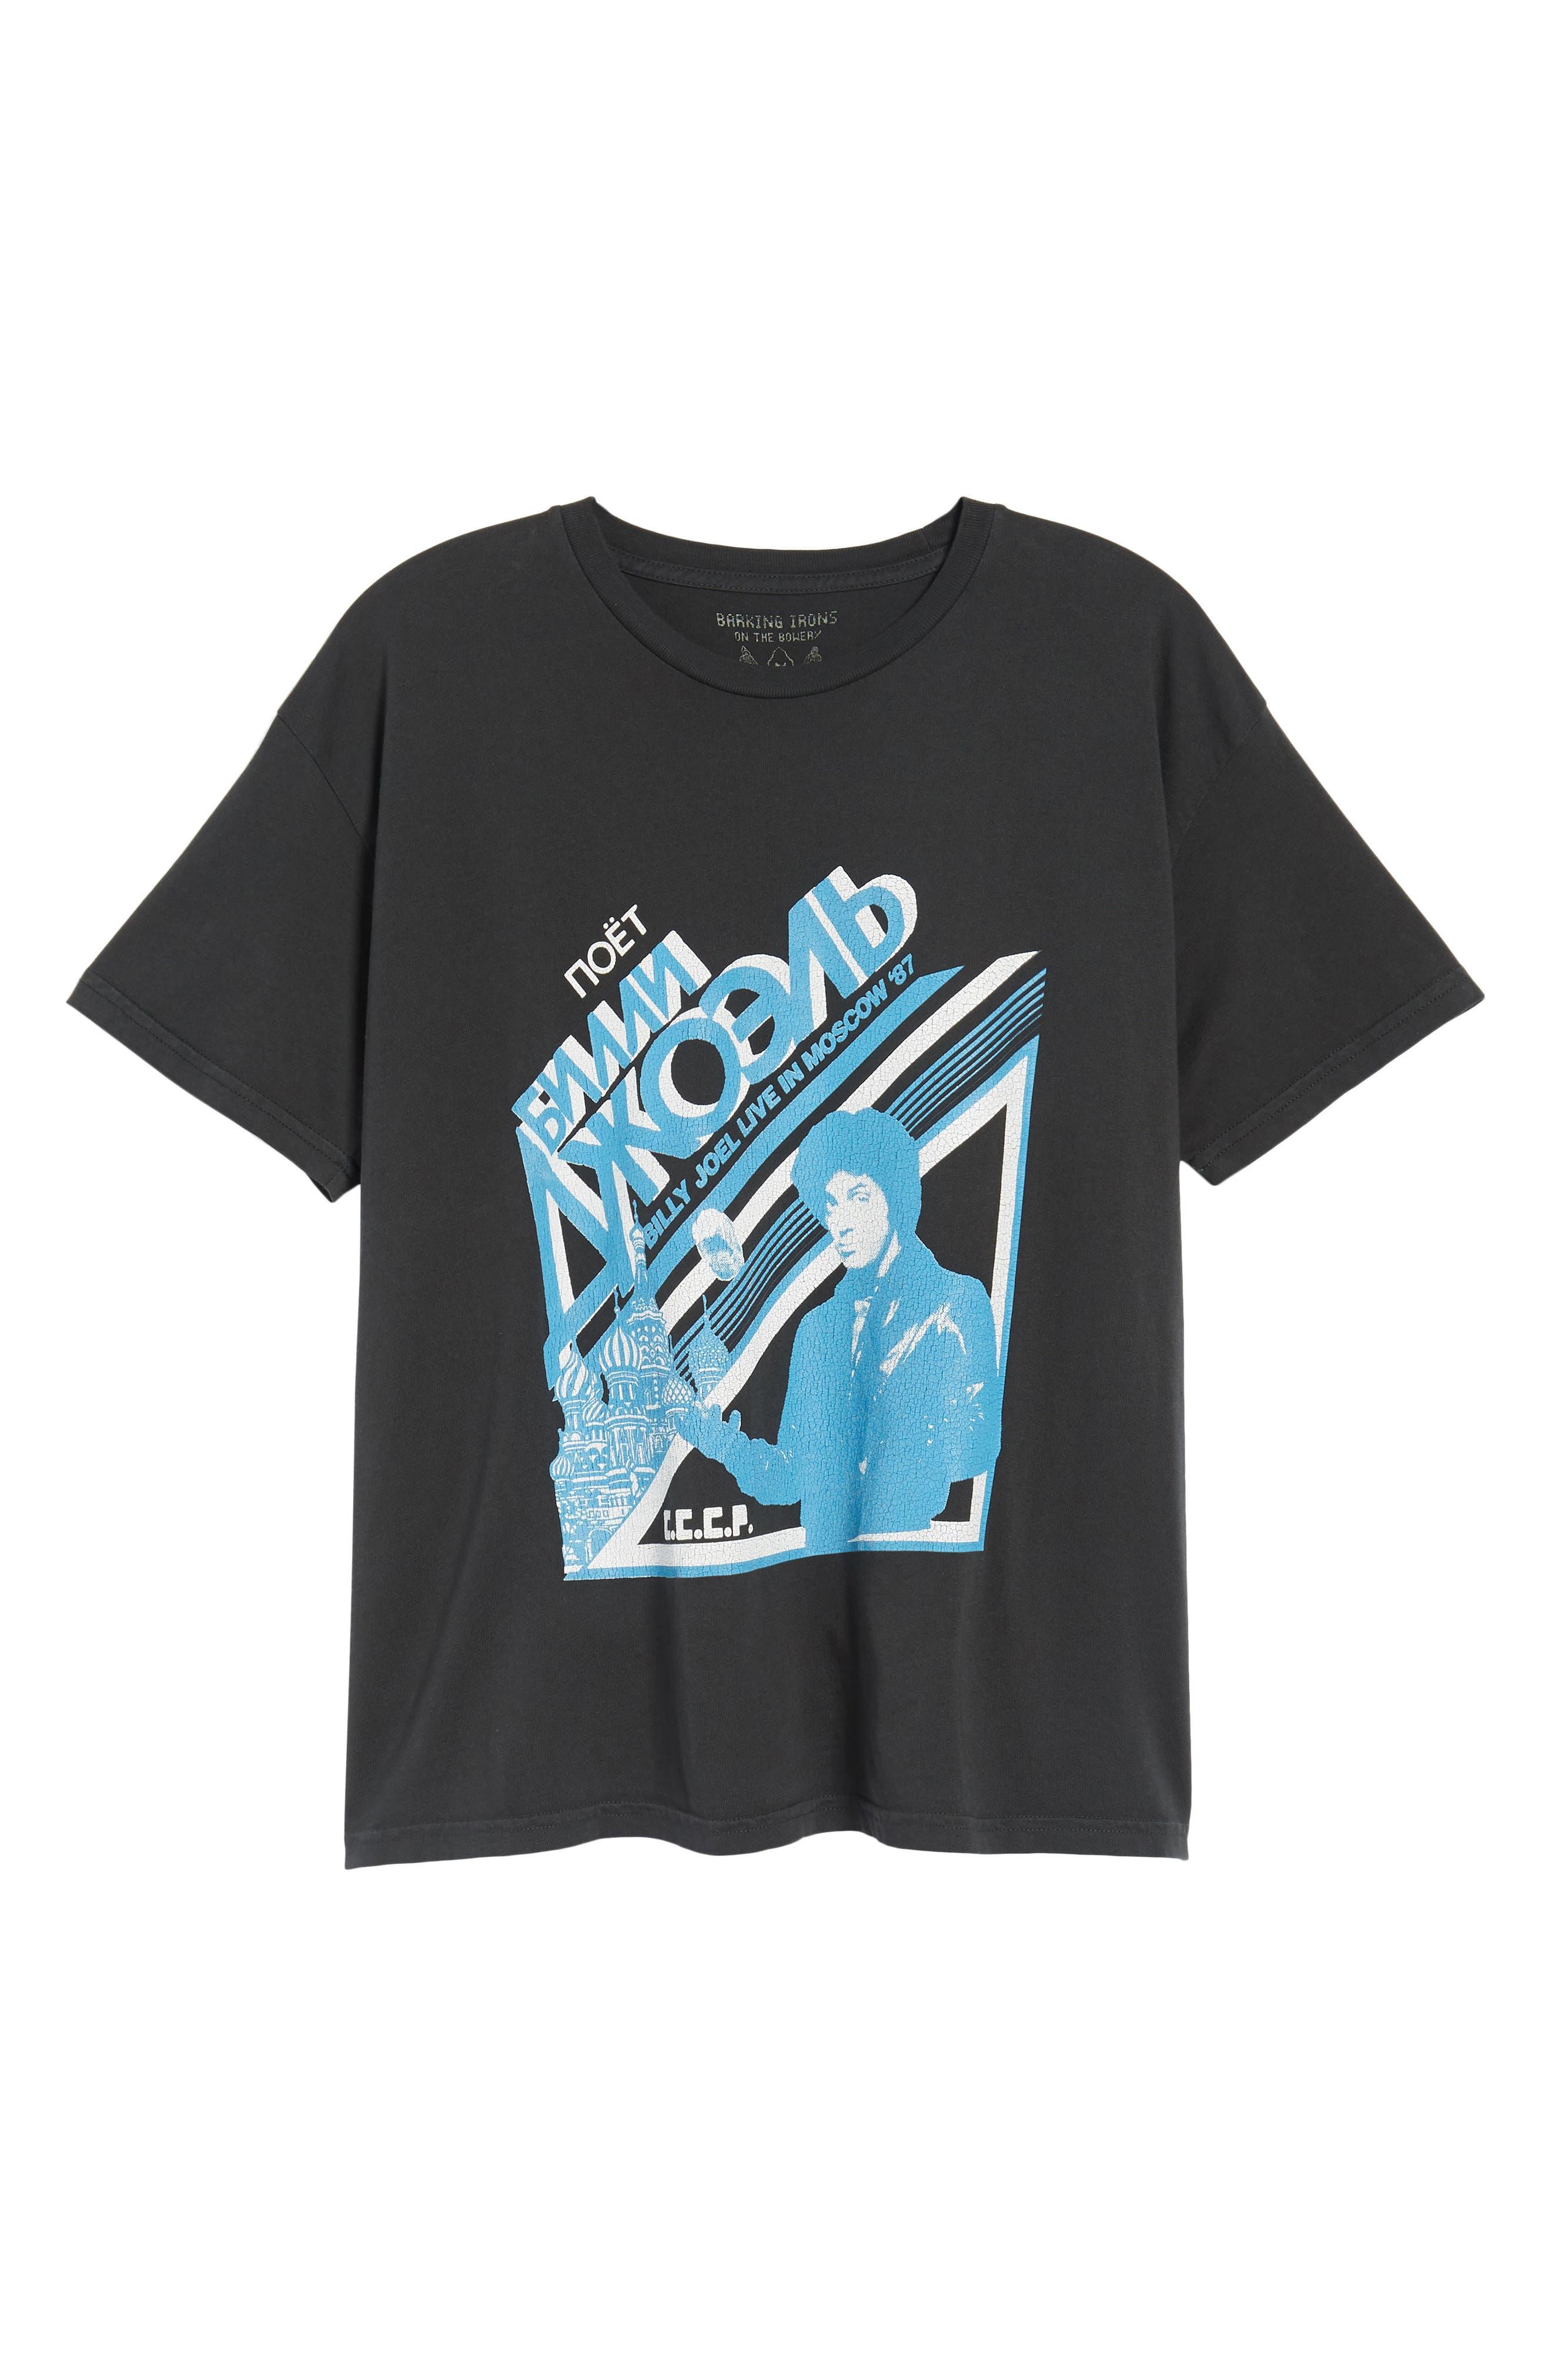 Billy Joel Moscow T-Shirt,                             Alternate thumbnail 6, color,                             Dusty Black